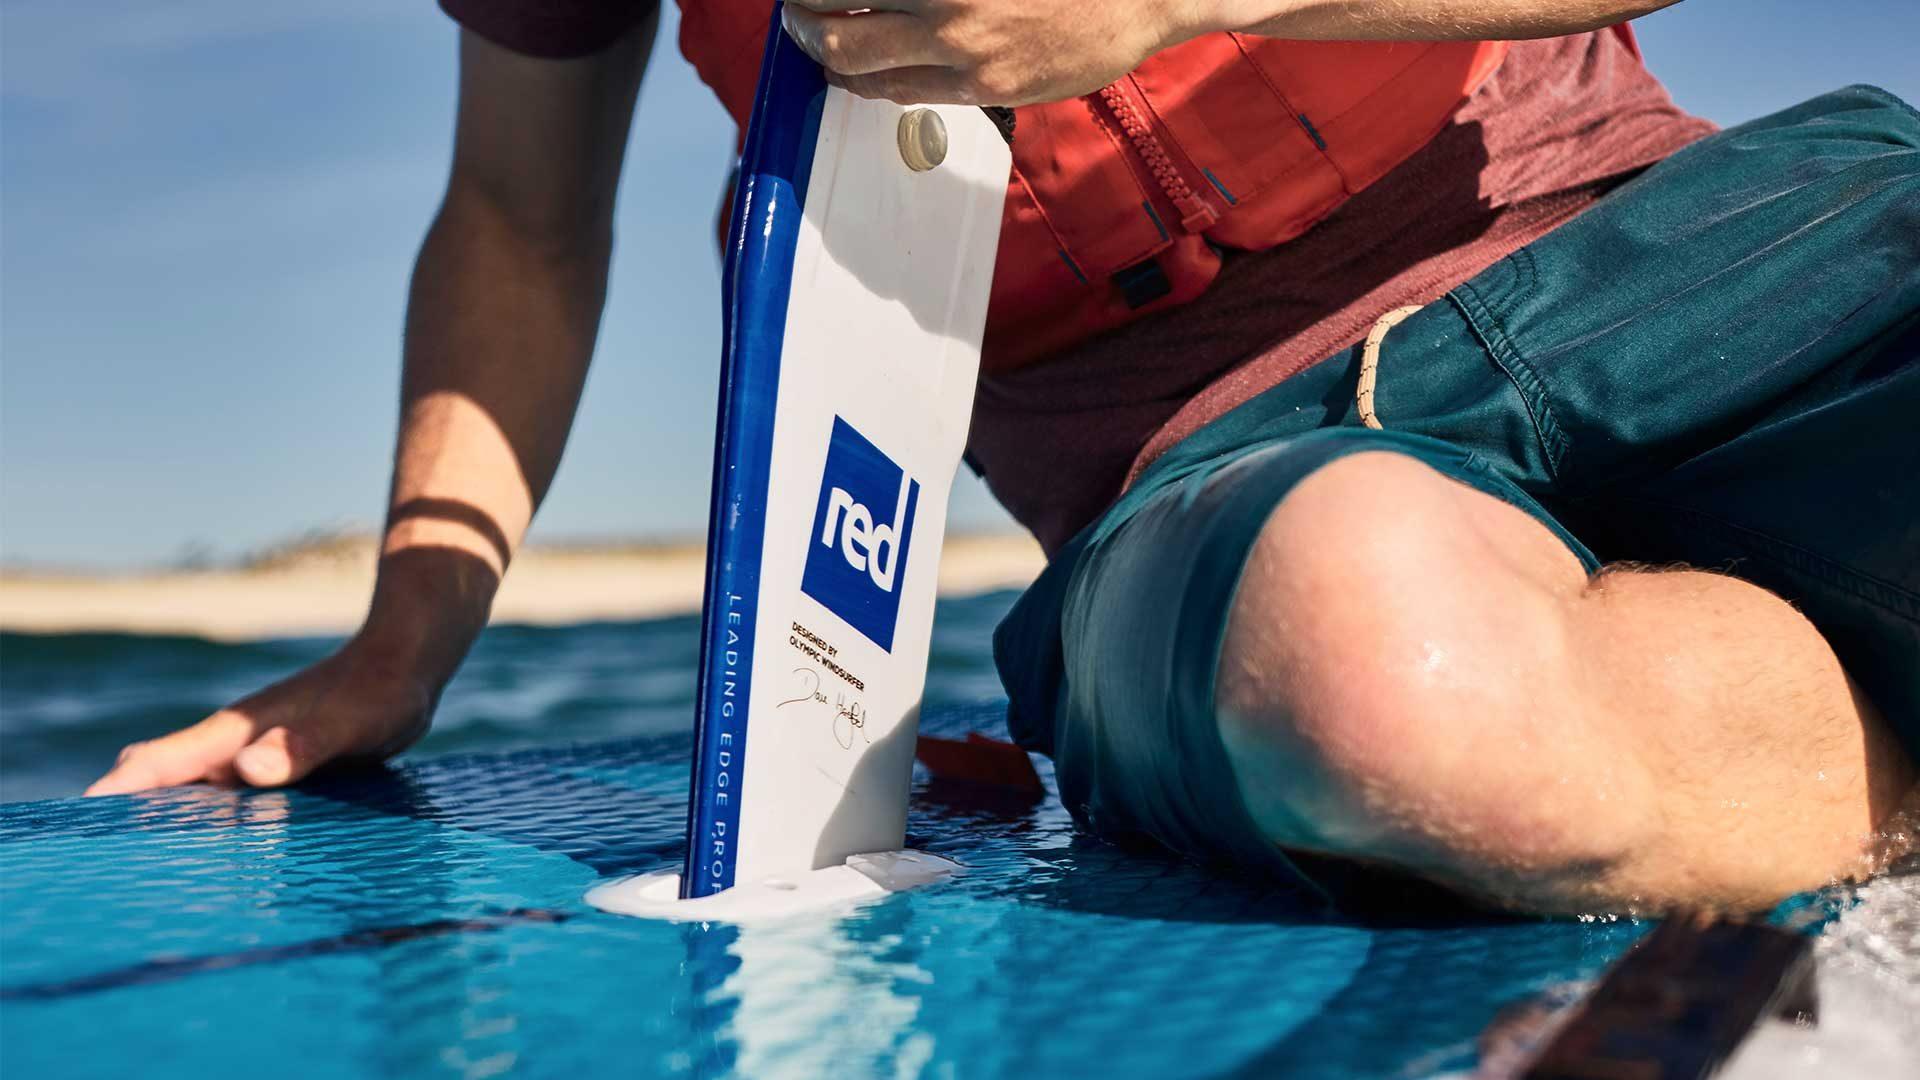 redpaddleco-107-windsurf-inflatable-paddle-board-desktop-gallery-deckpad